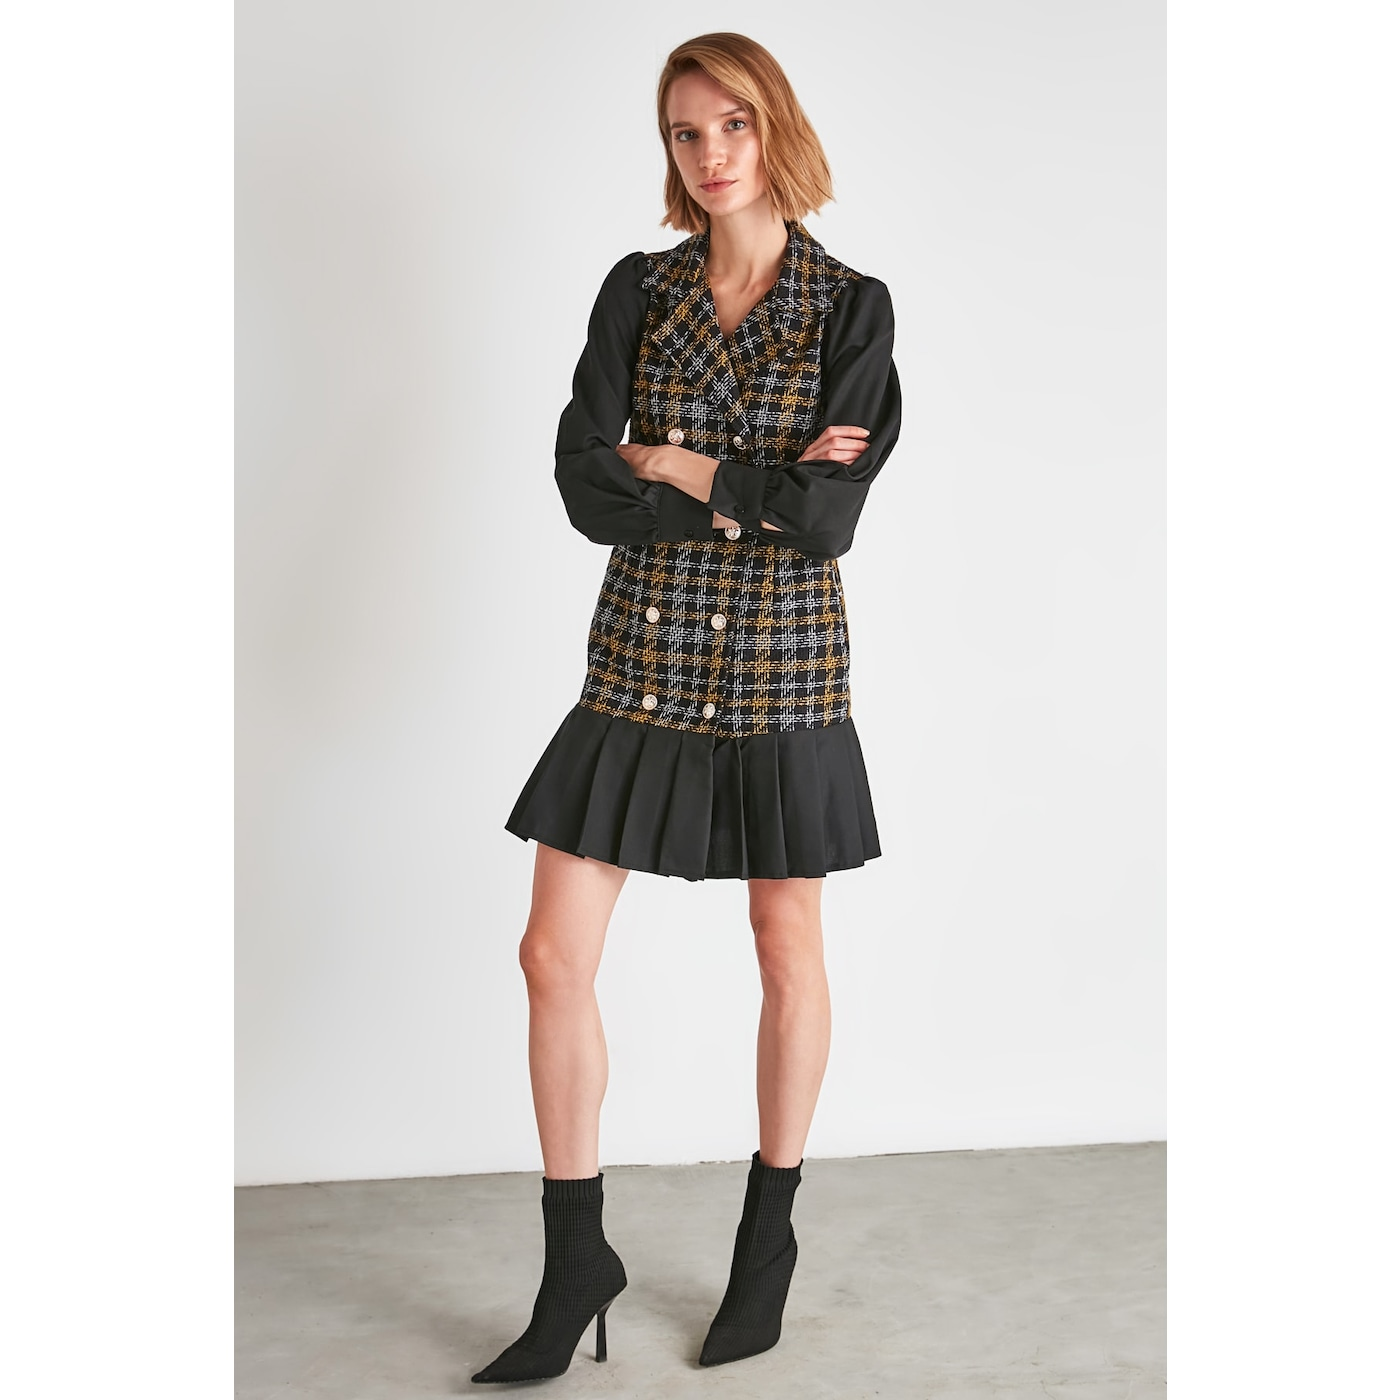 Trendyol Multicolored Tweed Jacket Dress dámské 36